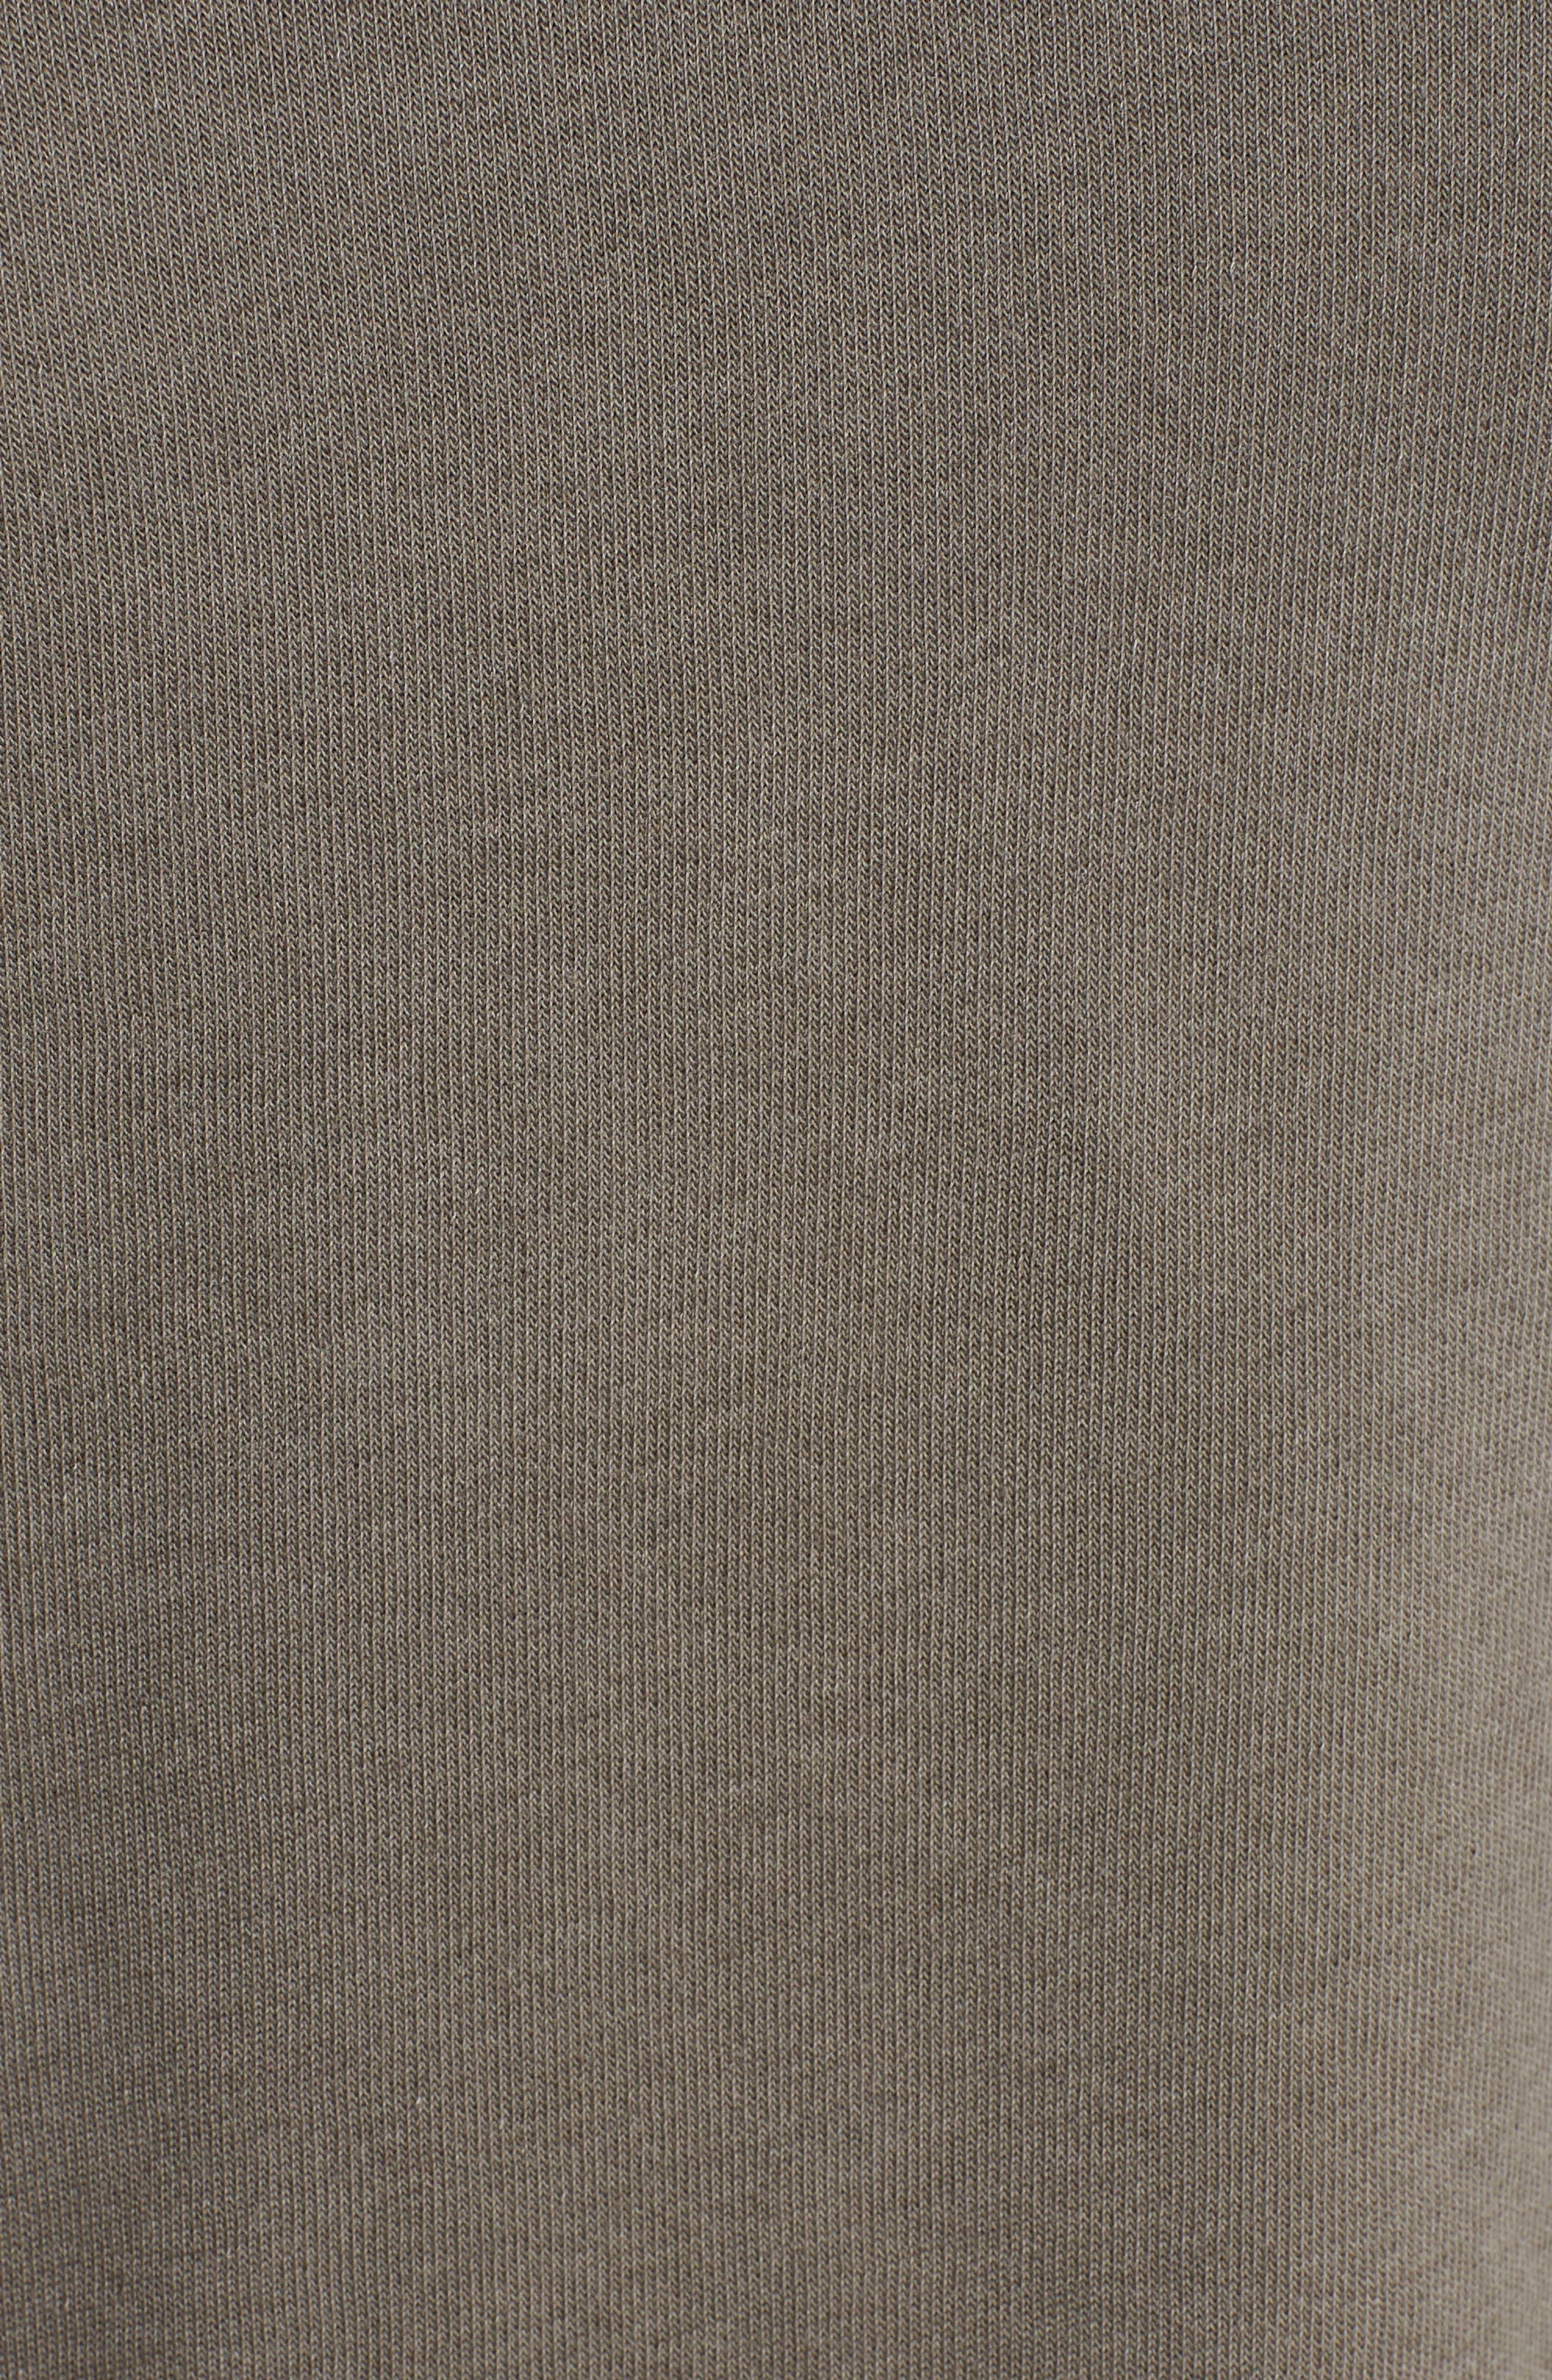 Tender - Sommers Sweatshirt,                             Alternate thumbnail 6, color,